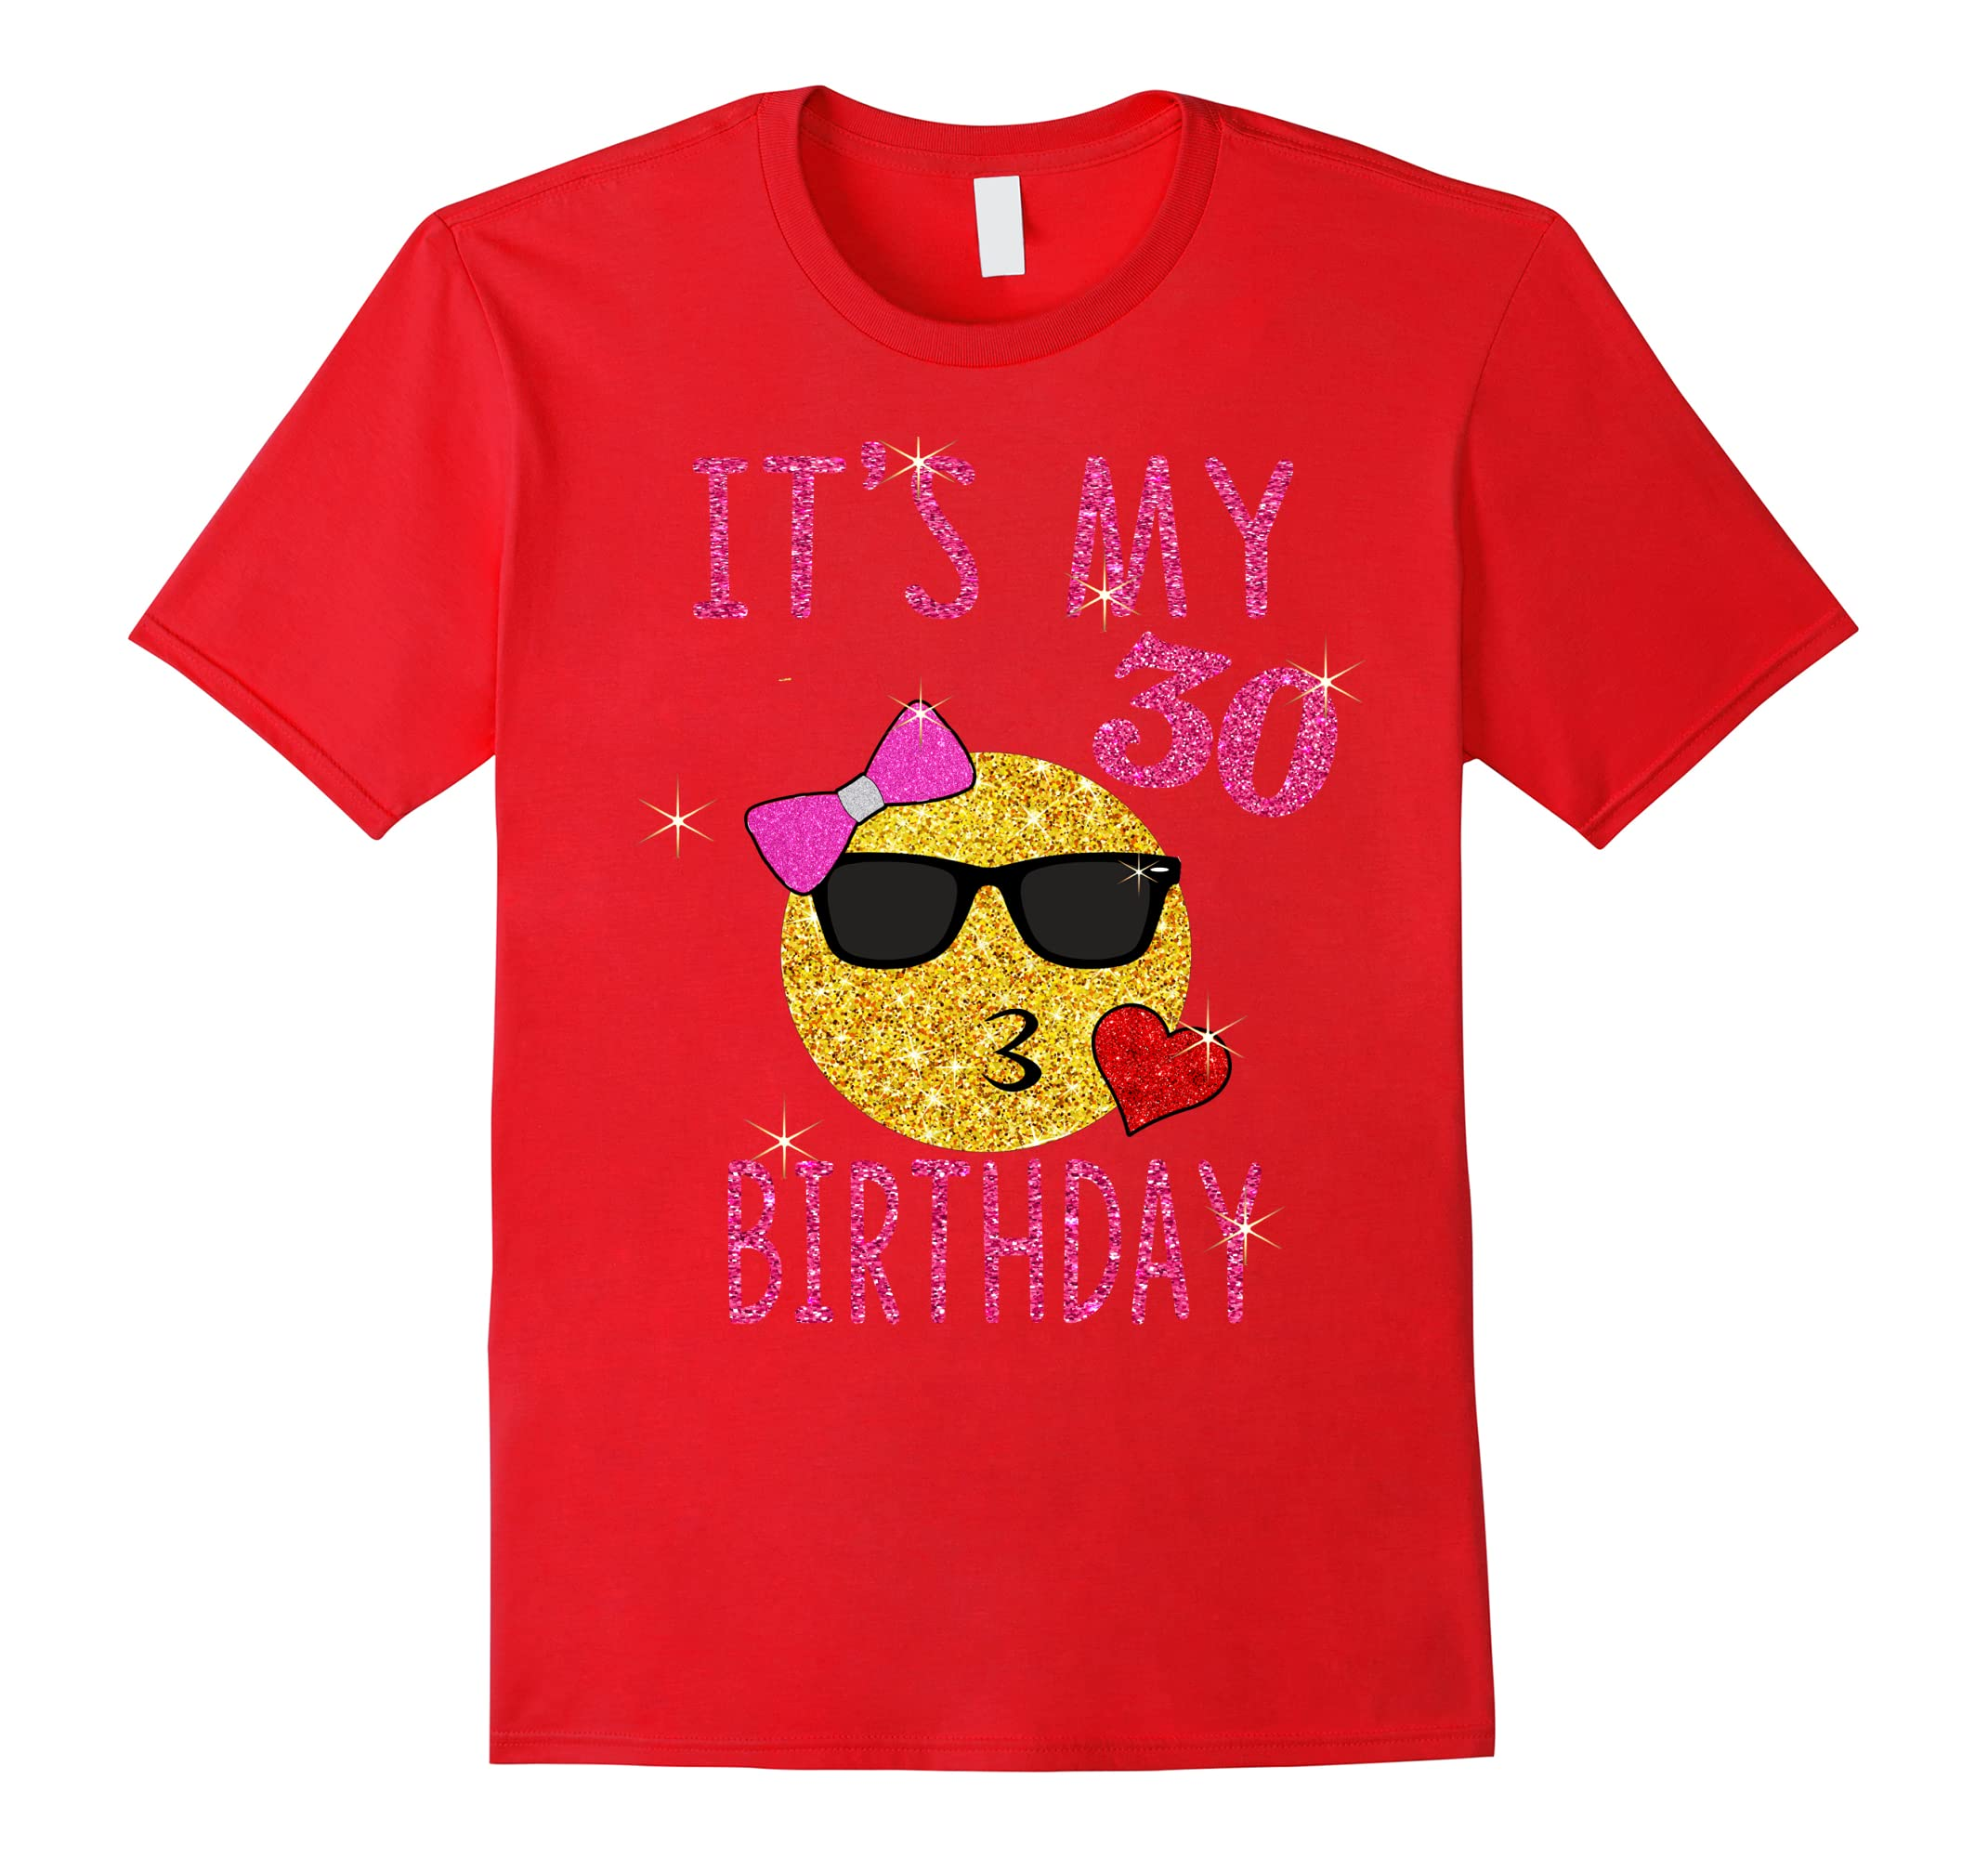 Cute Emoji 30 Years Old Shirt Its My 30th Birthday Gift RT